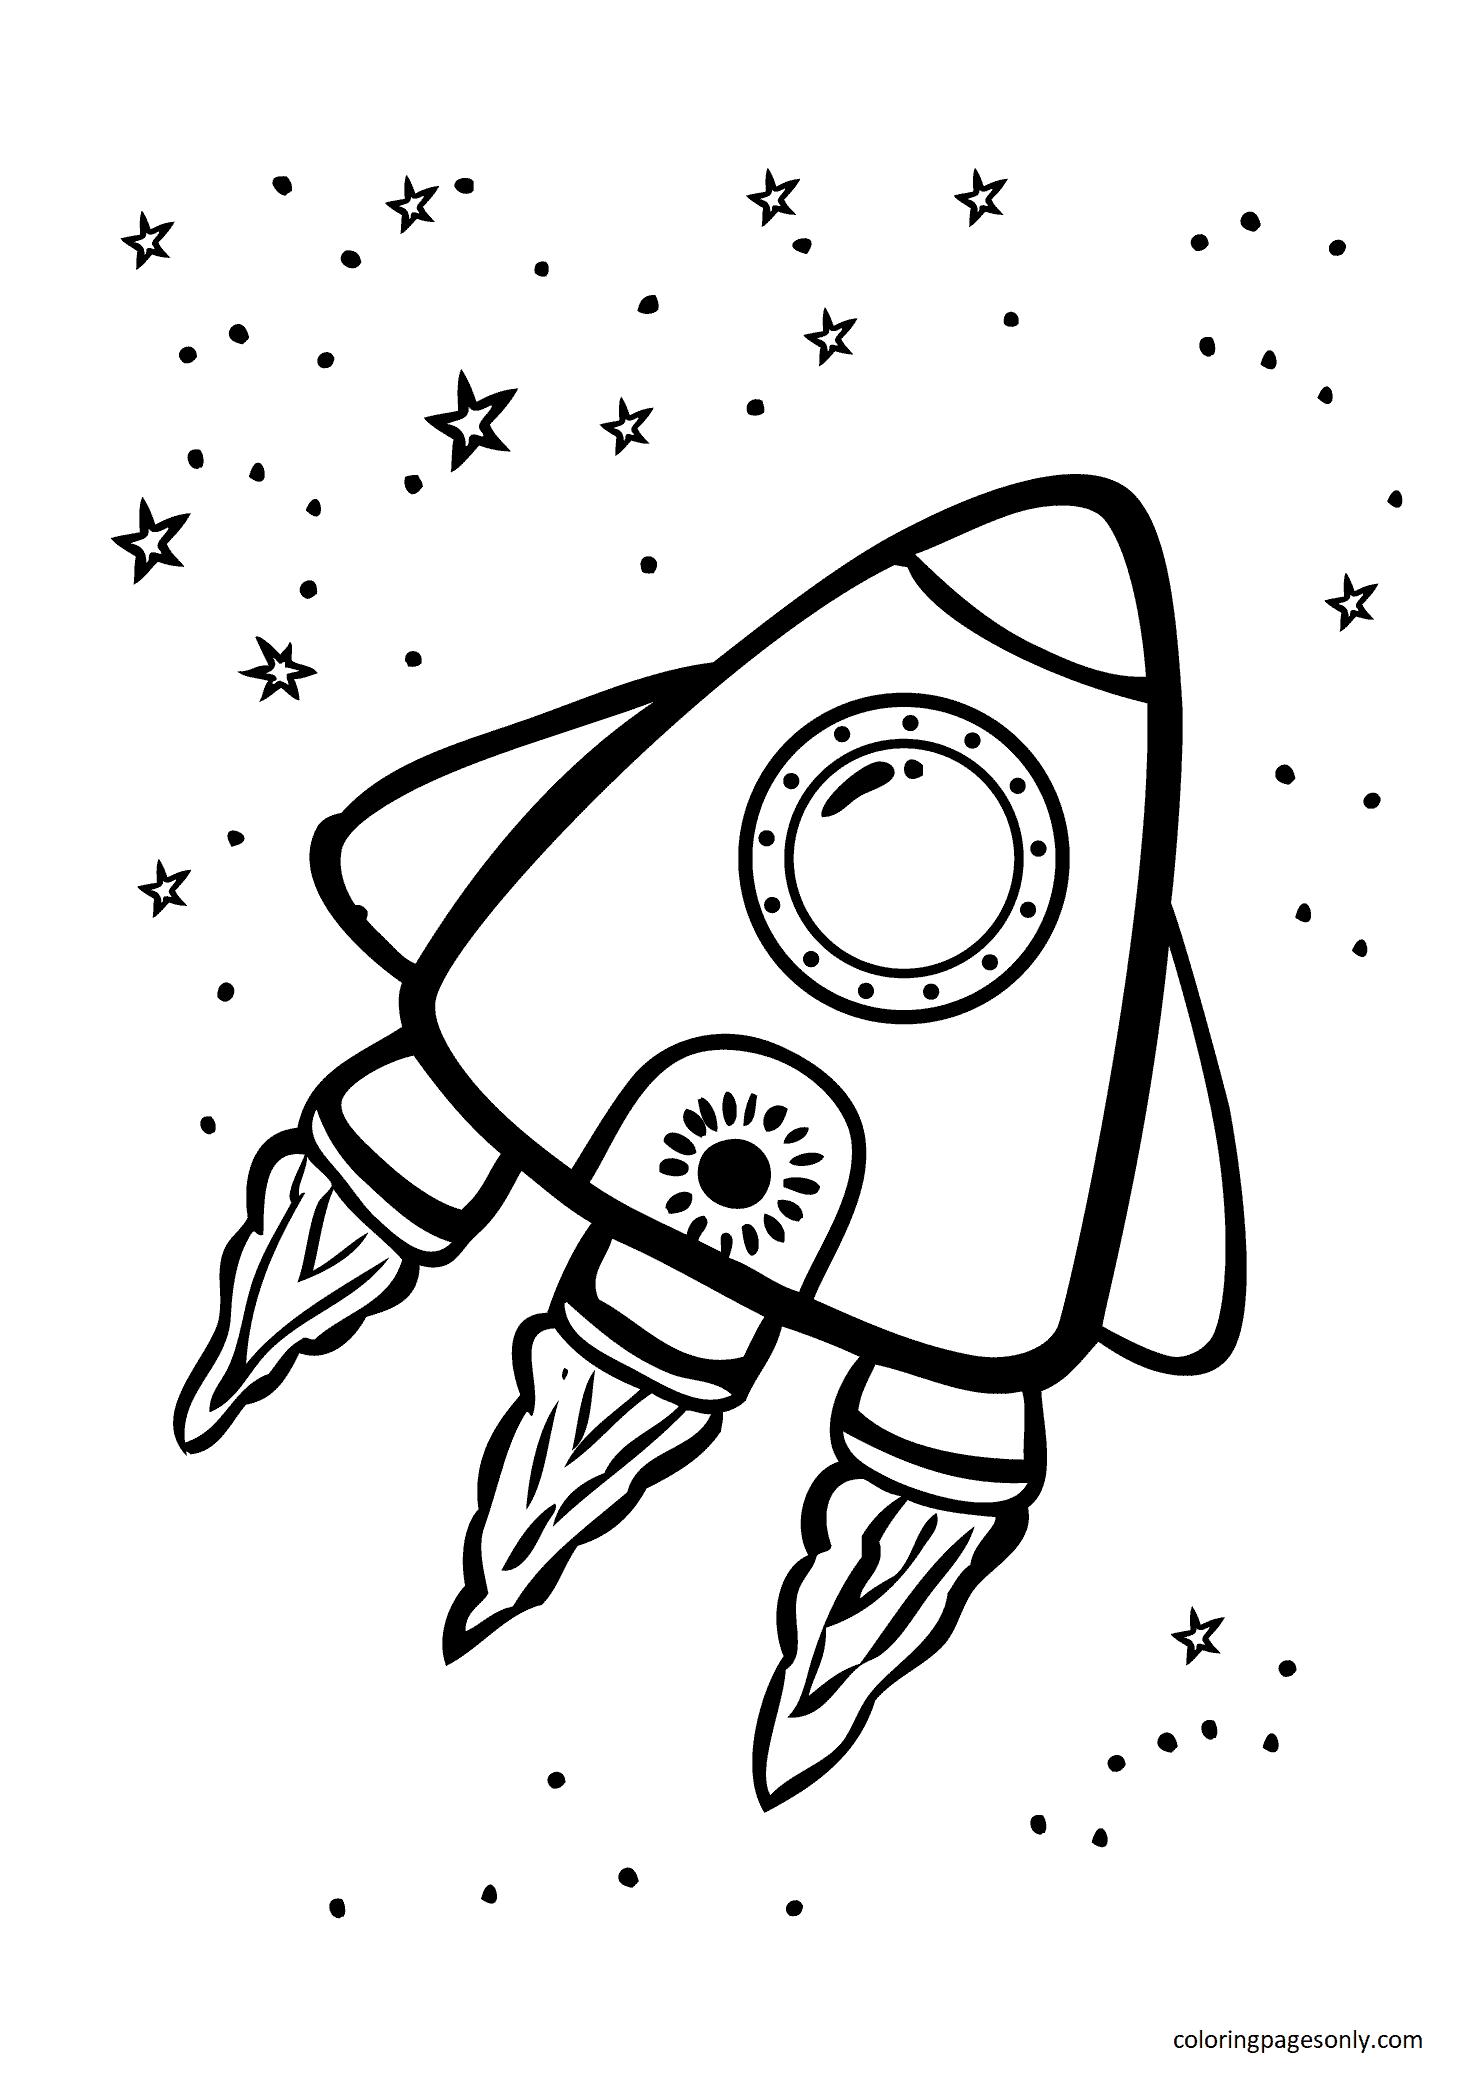 Brave Rocket Coloring Page